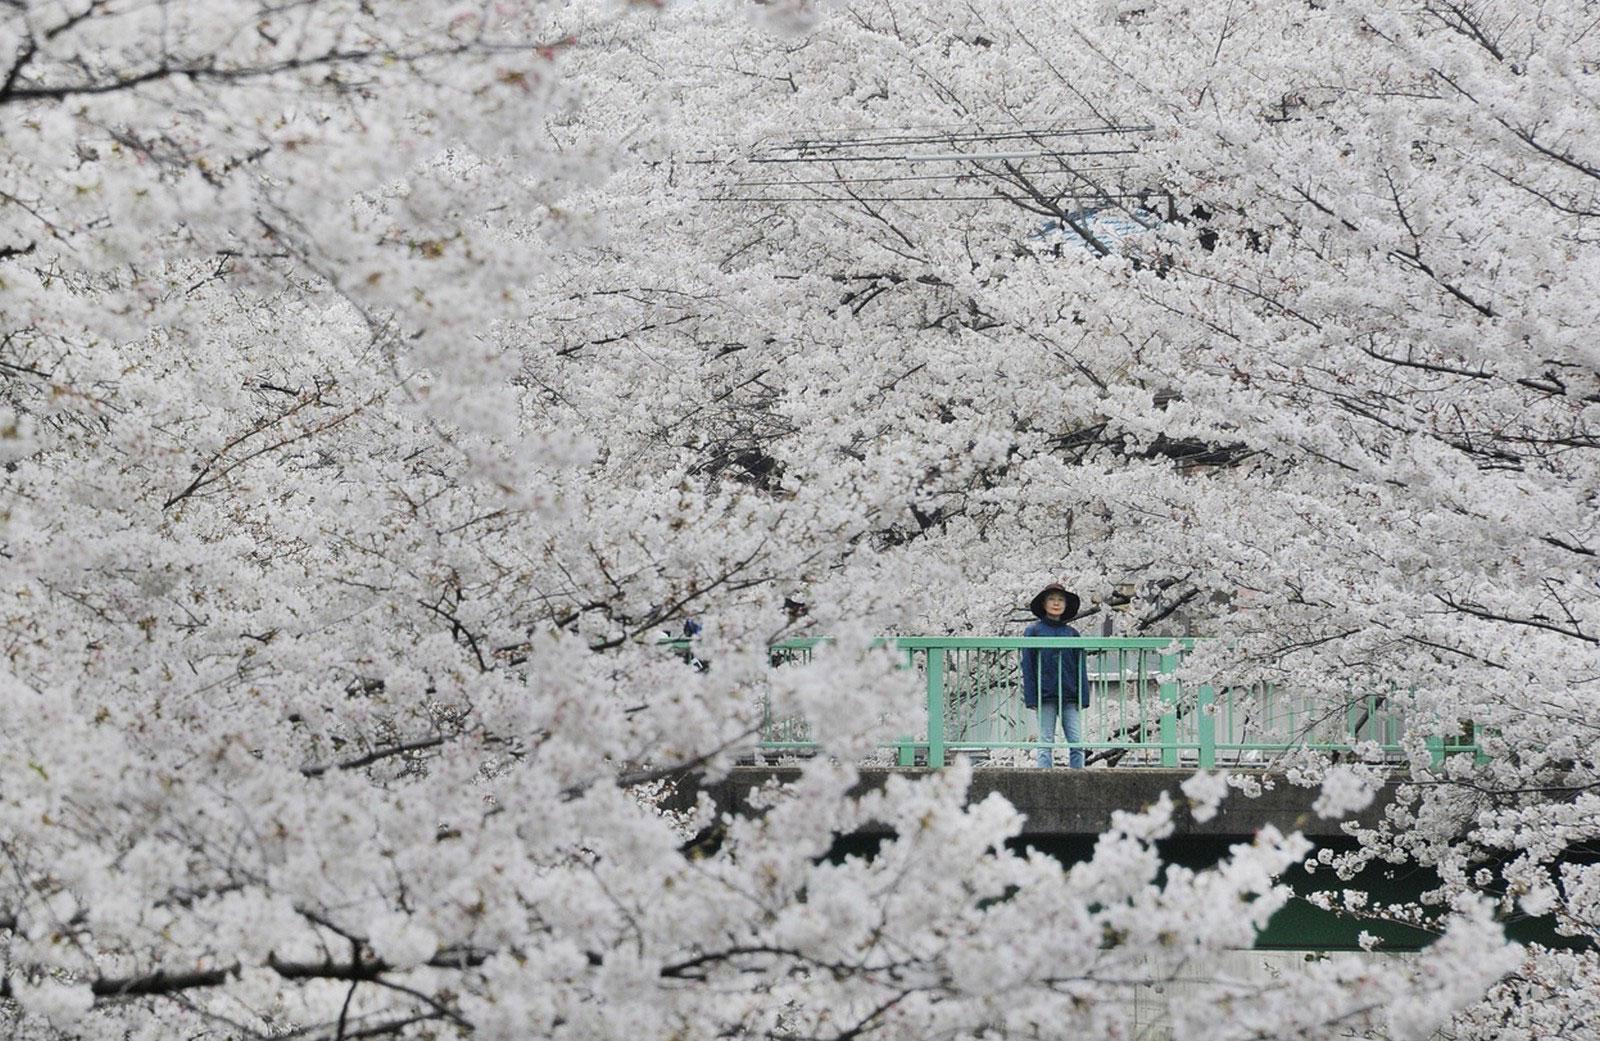 Вишневый сад, снимок